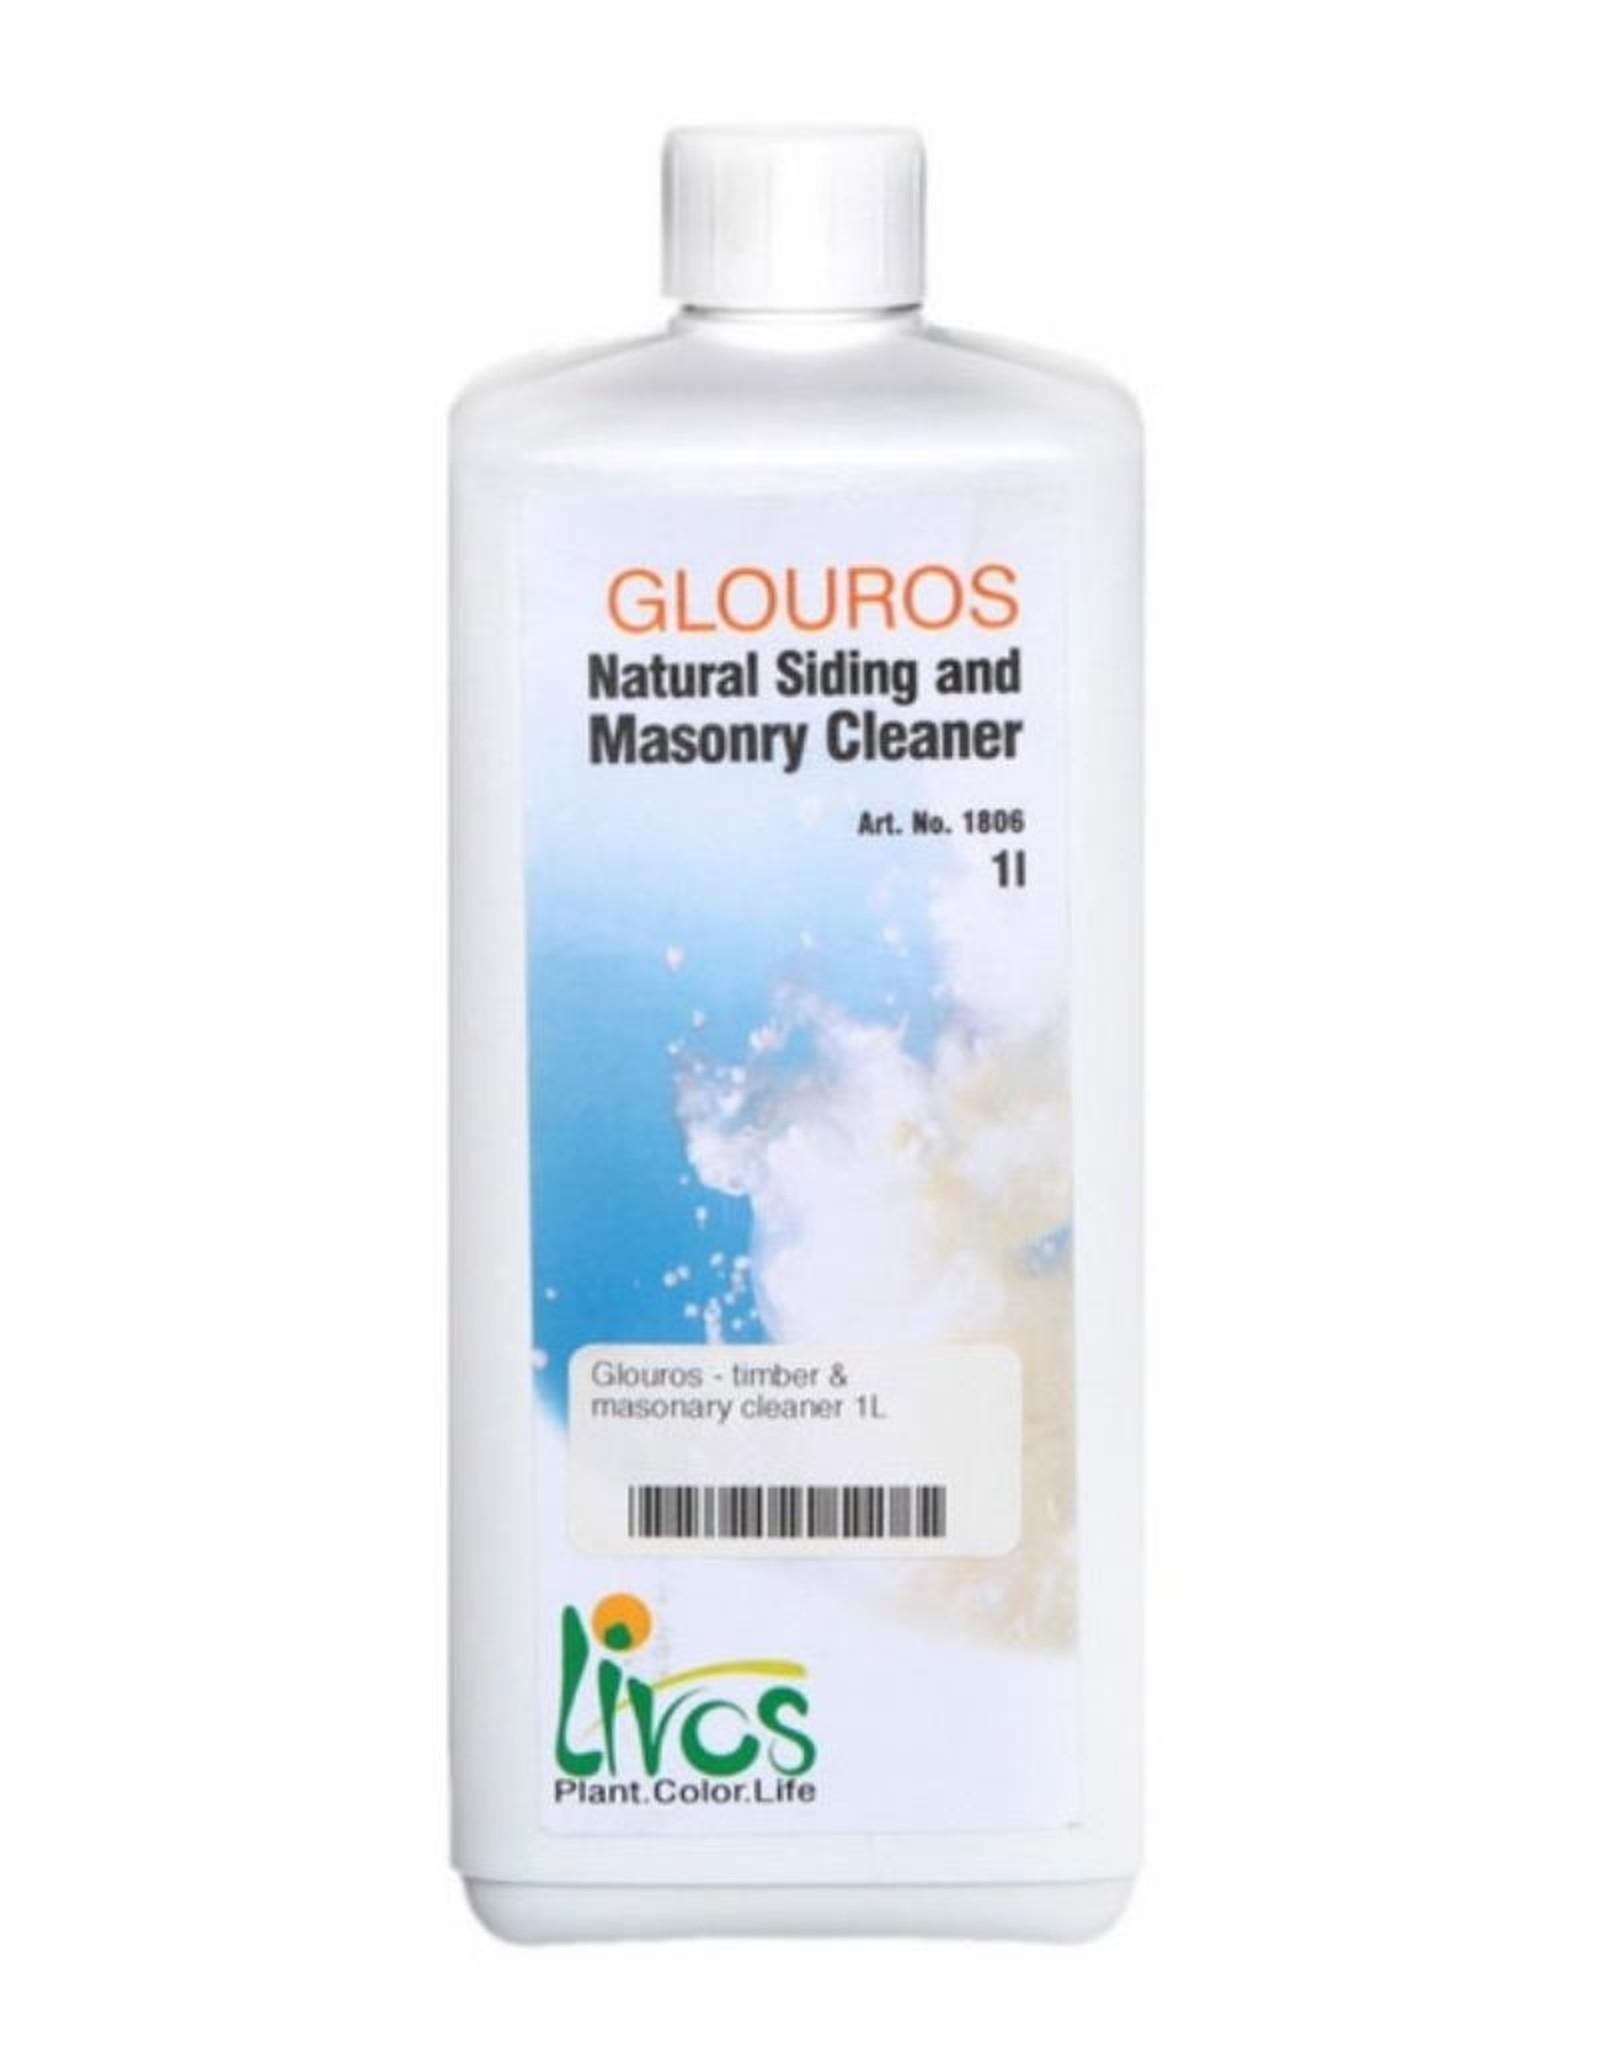 LIVOS Glouros - Timber & Masonry Cleaner